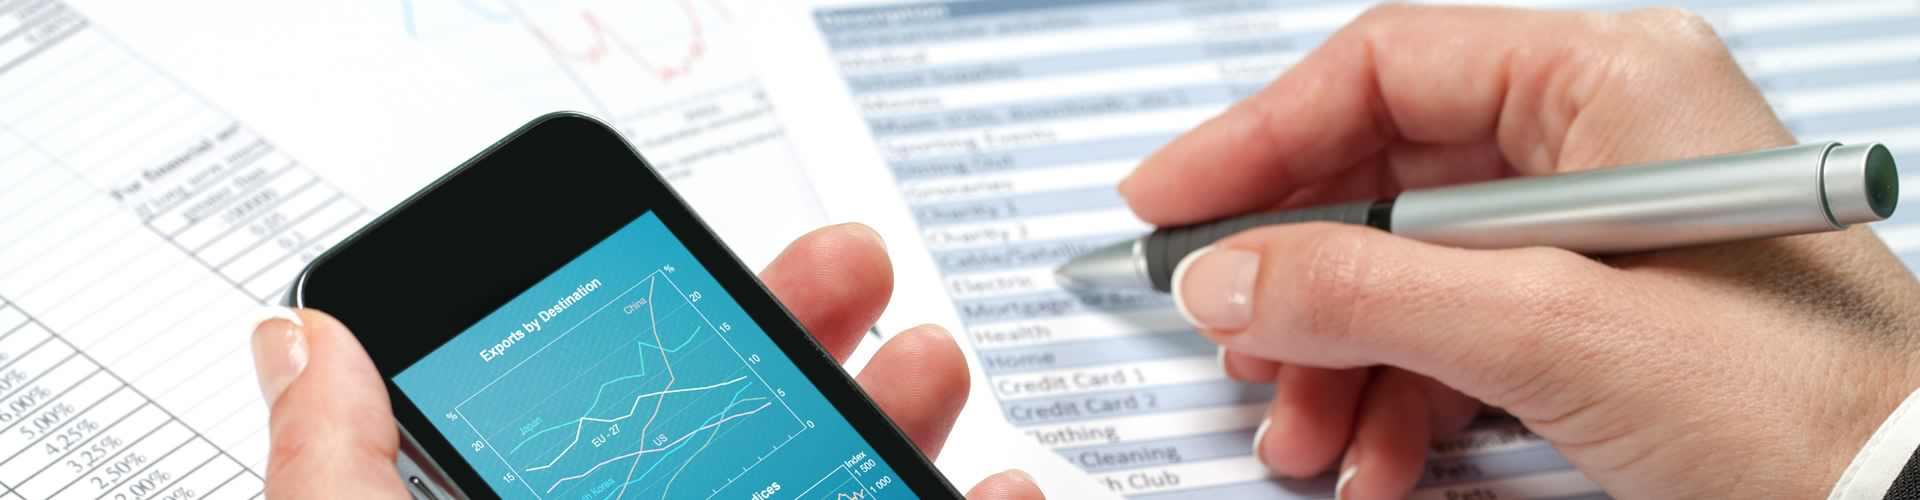 SC Contacor Expert SRL - Audit Financiar Bucuresti Sector 2